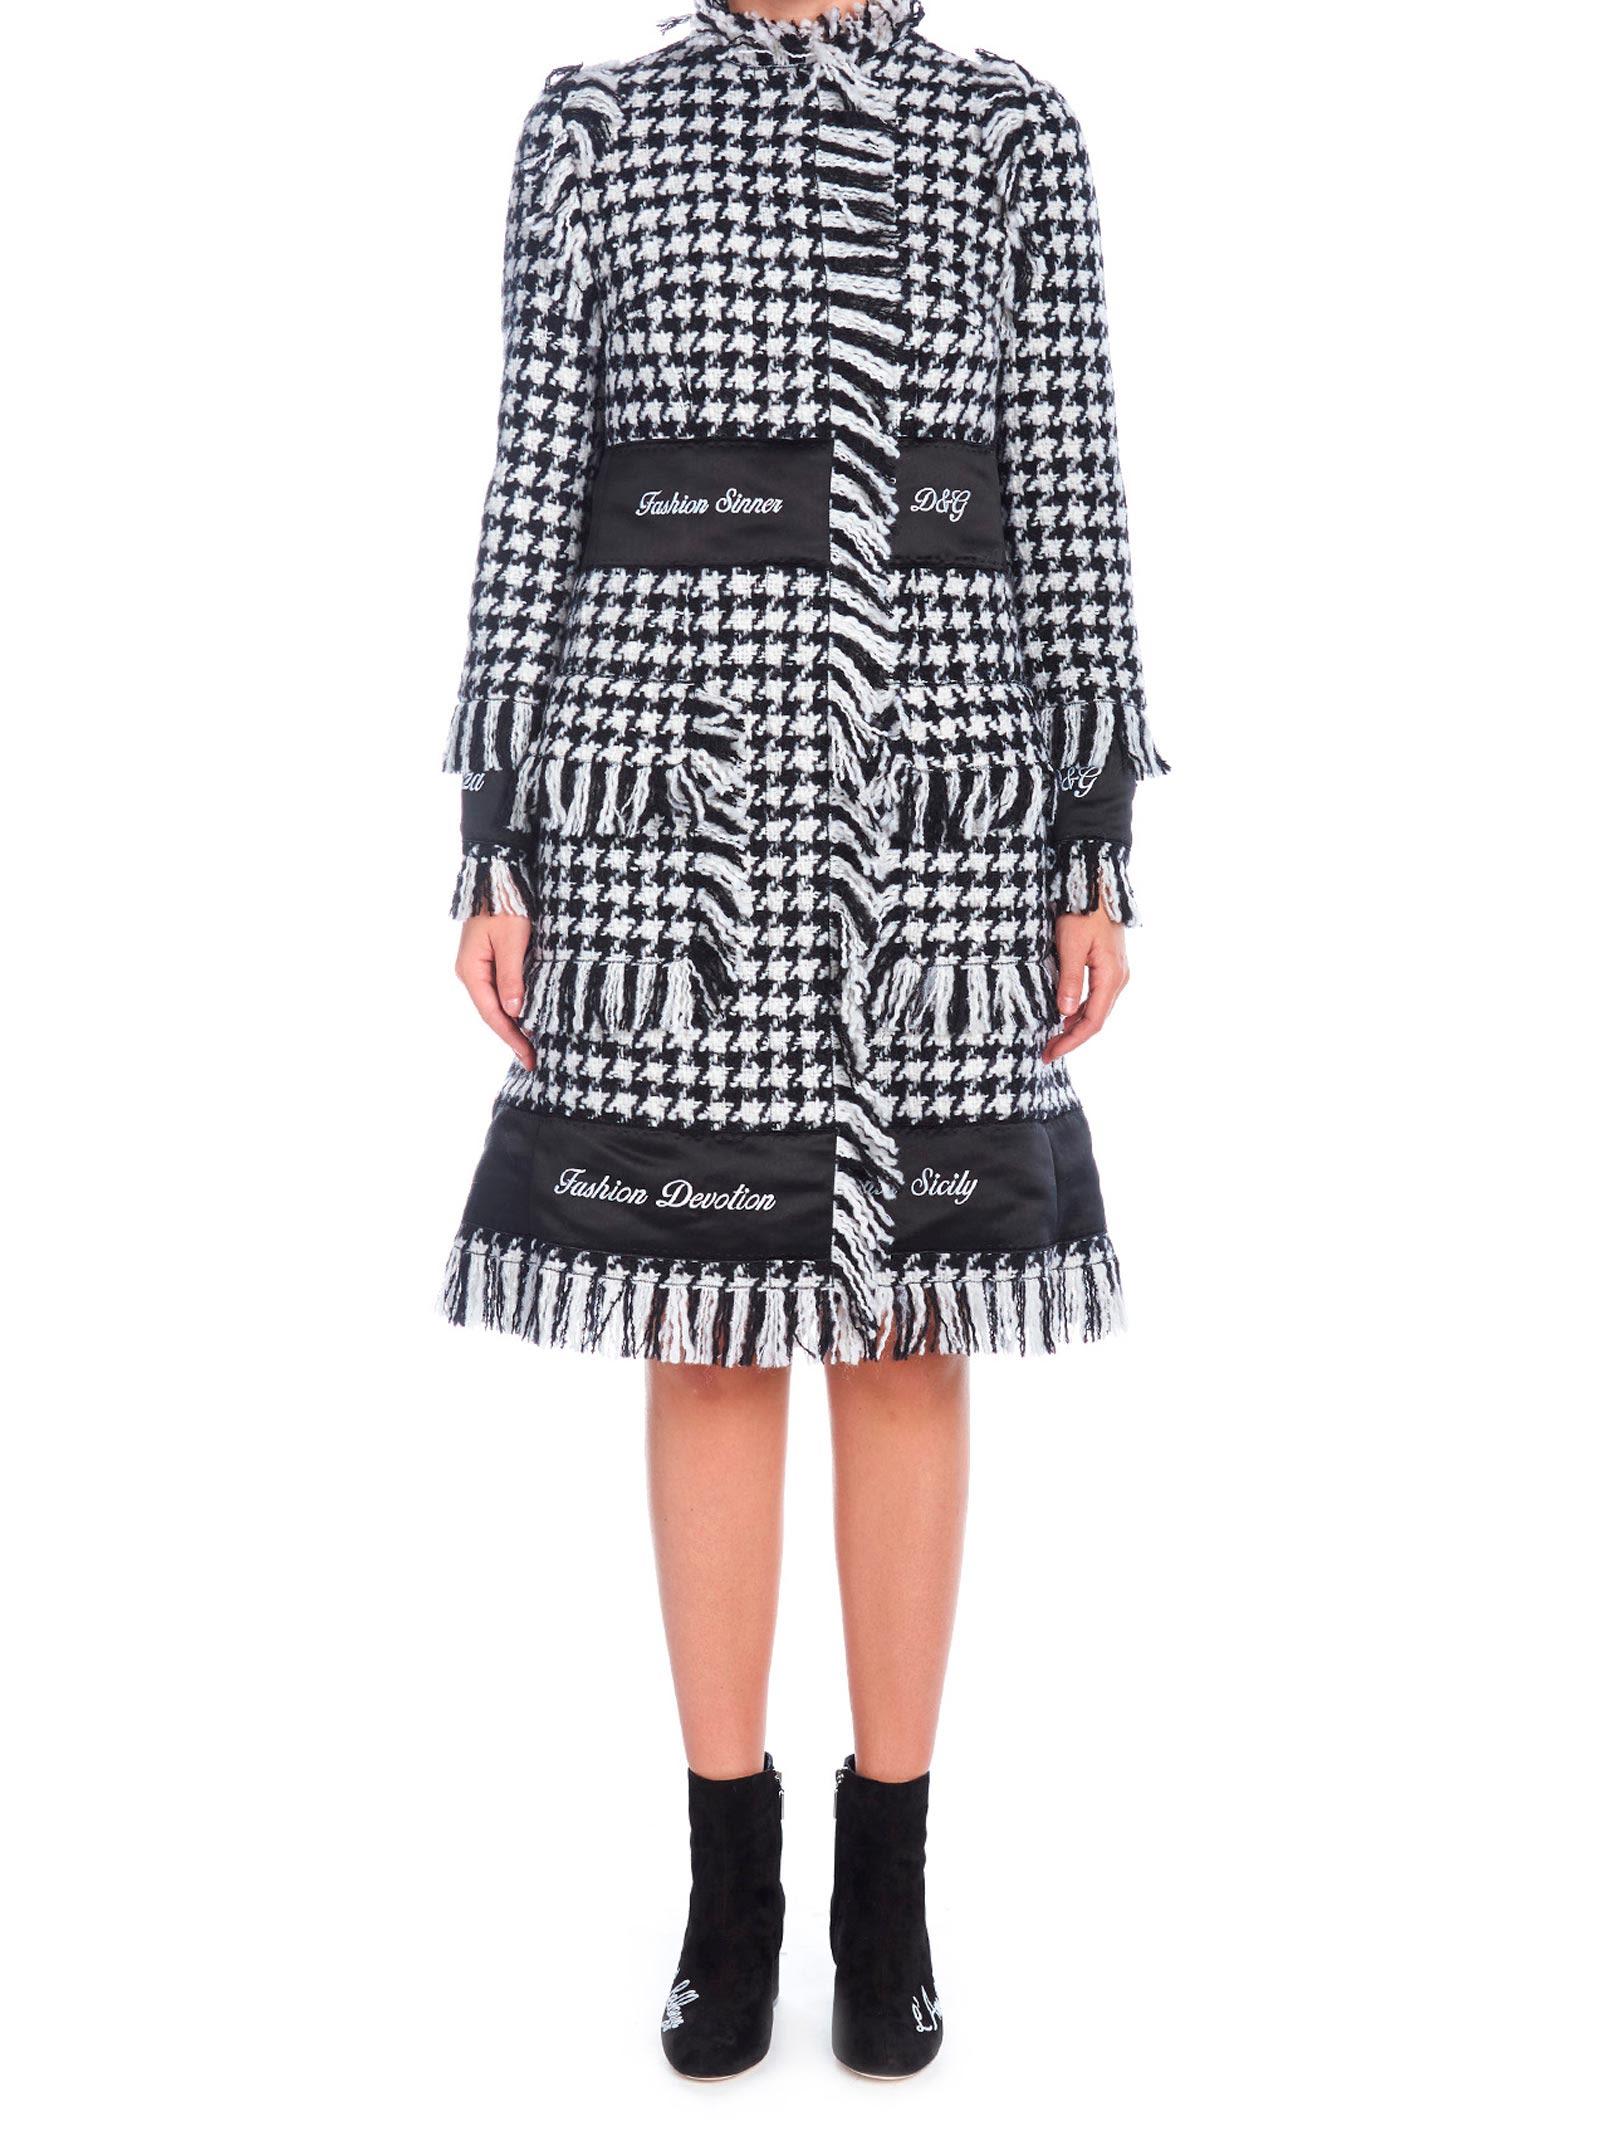 Two Color Mixed Wool Pied De Poule Coat in Black & White